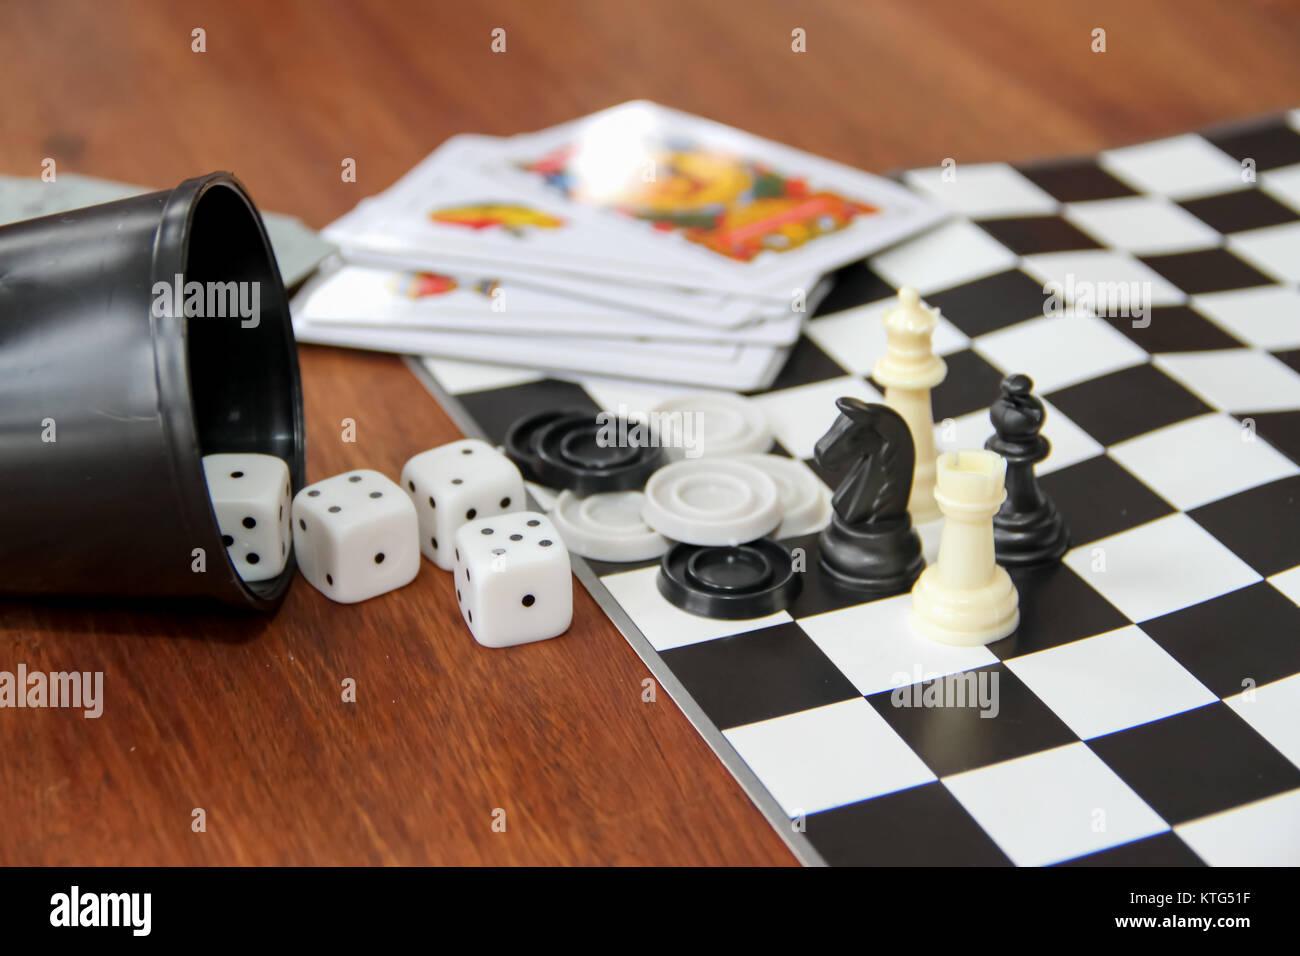 Mezcla De Caliz De Juegos De Mesa De Cartas De Poquer Espanol Dados